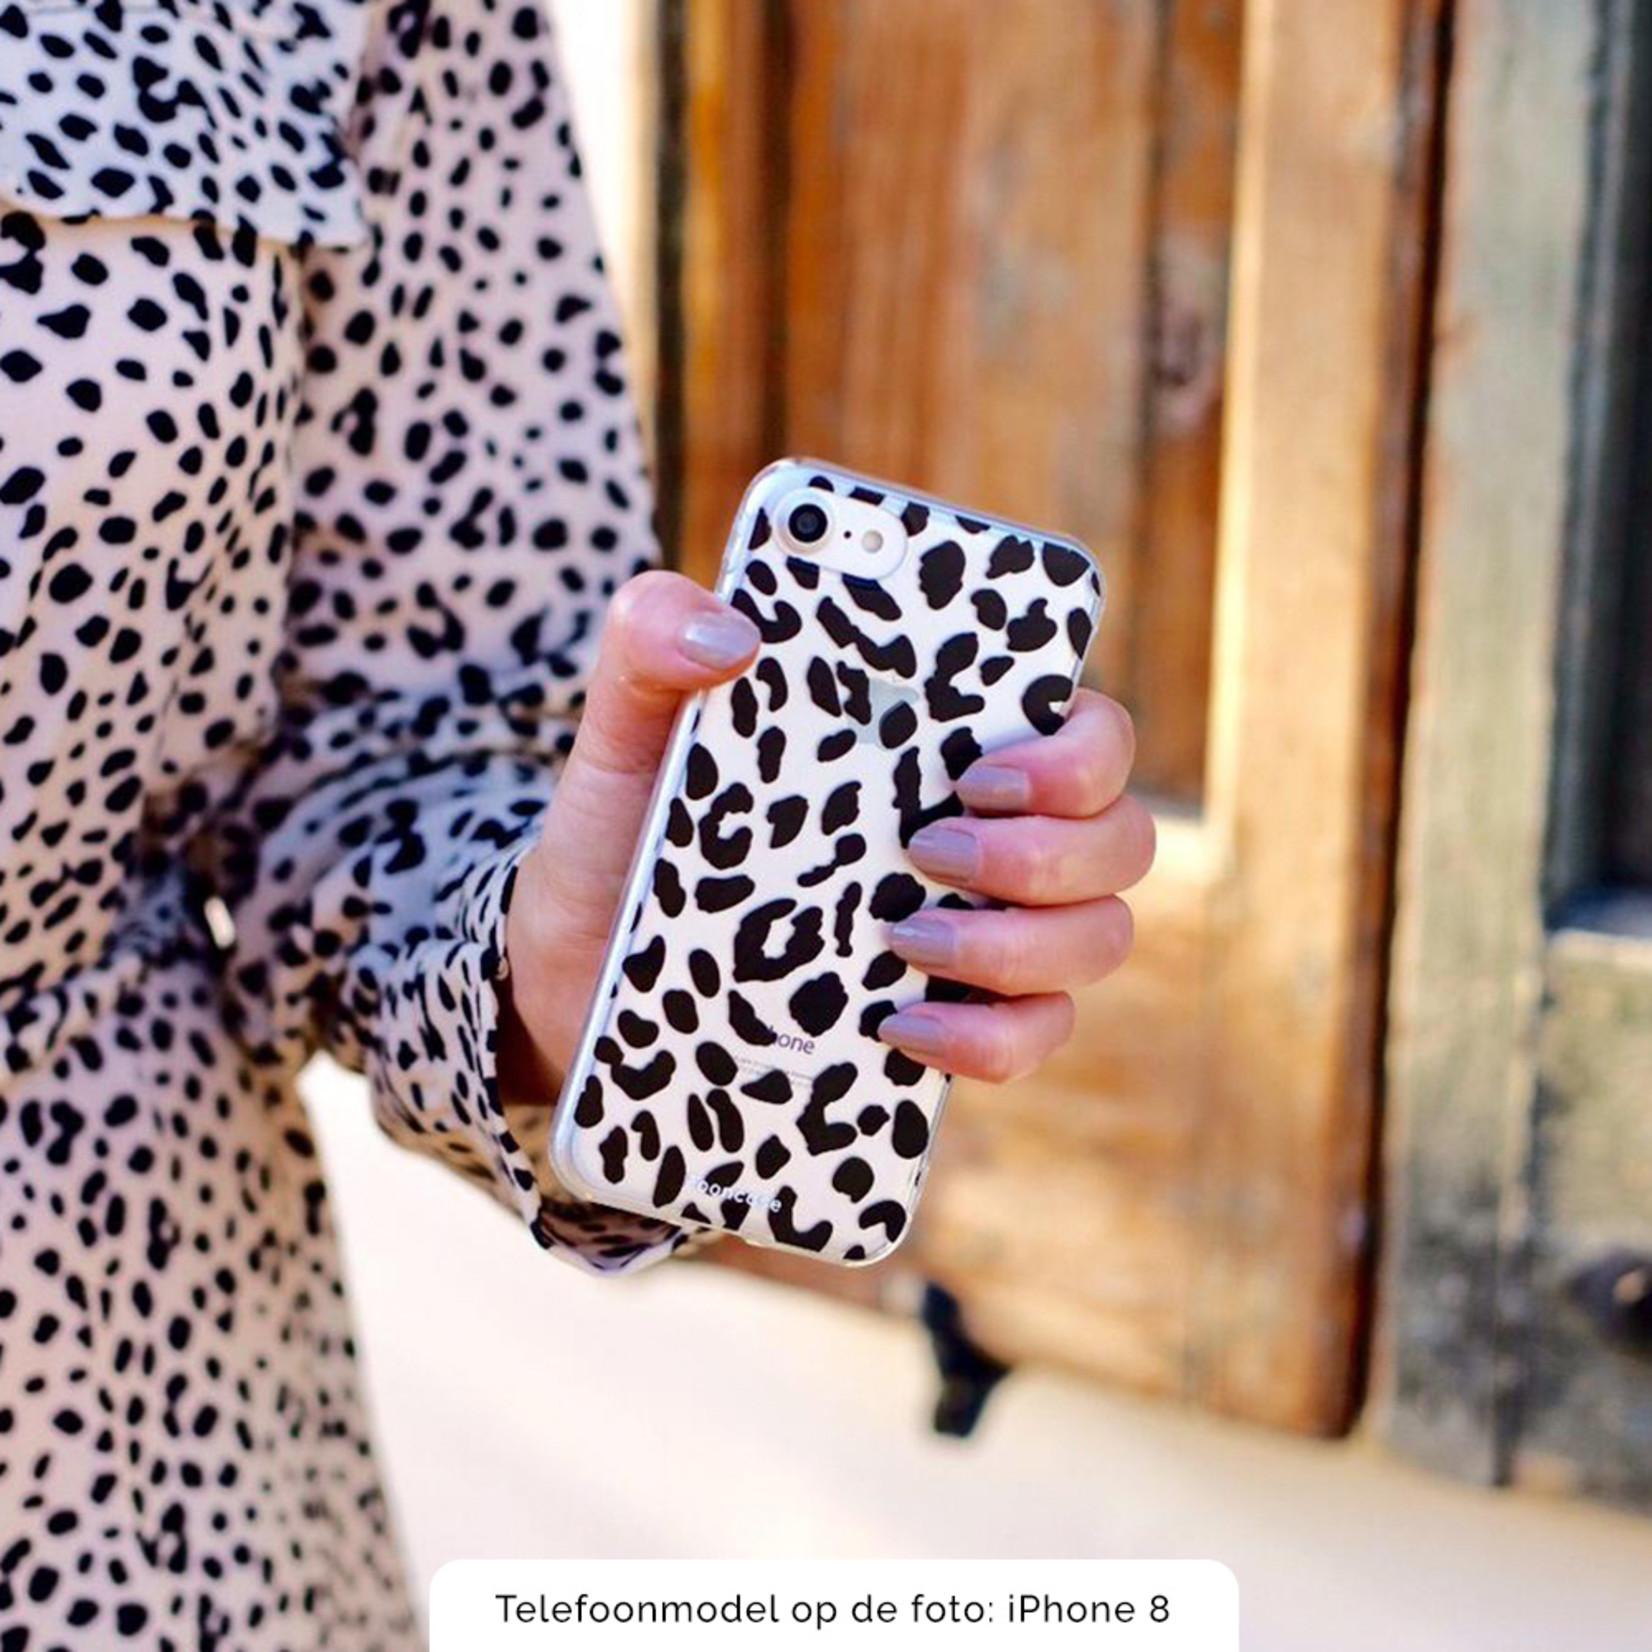 FOONCASE Huawei P10 Lite hoesje TPU Soft Case - Back Cover - Luipaard / Leopard print